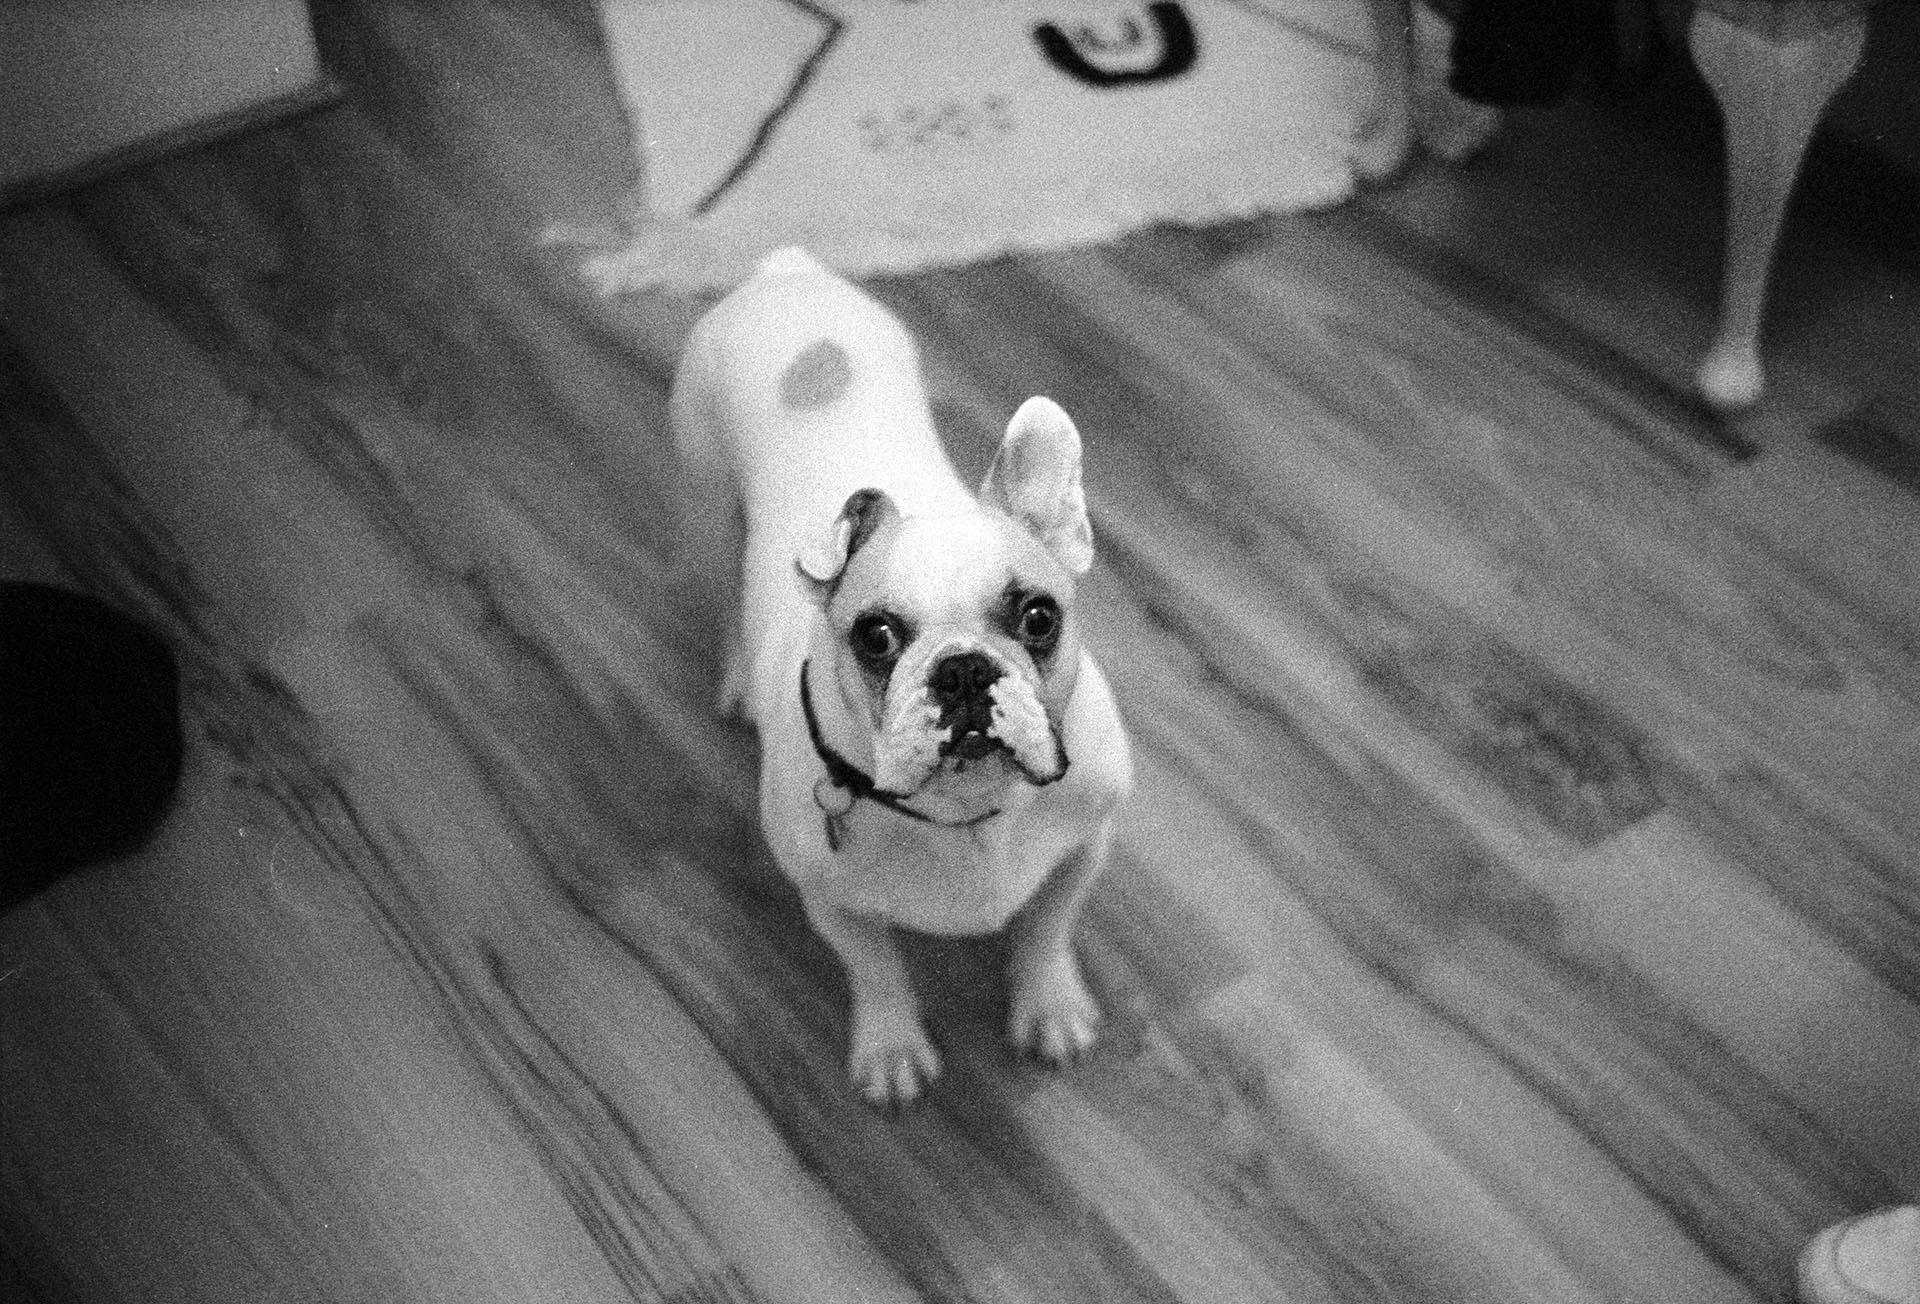 Leica M6 dog